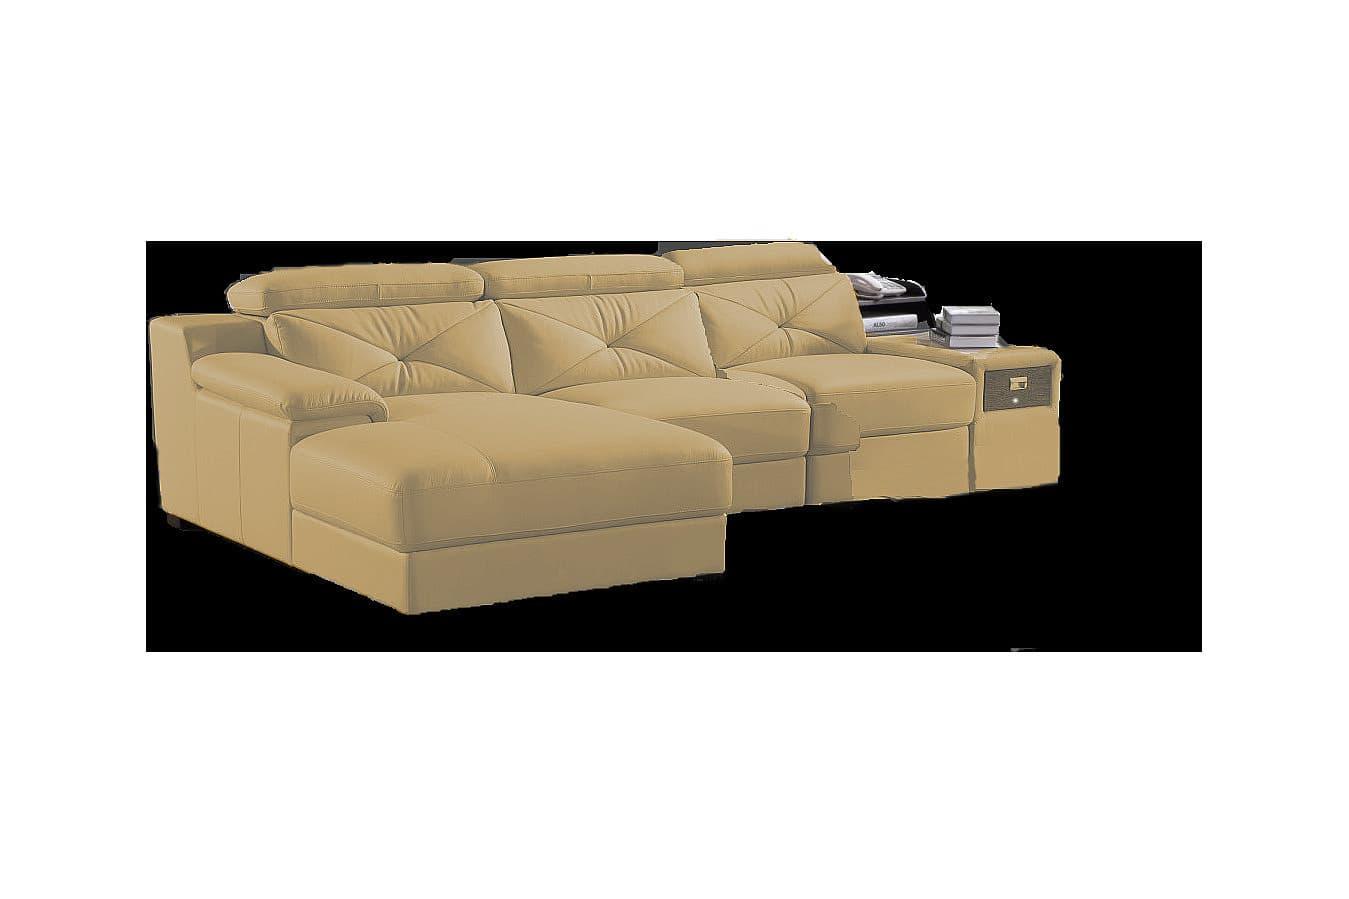 canap d 39 angle cuir tema 290 expo canap contemporain d angle cuir 4 places 290x170x102. Black Bedroom Furniture Sets. Home Design Ideas